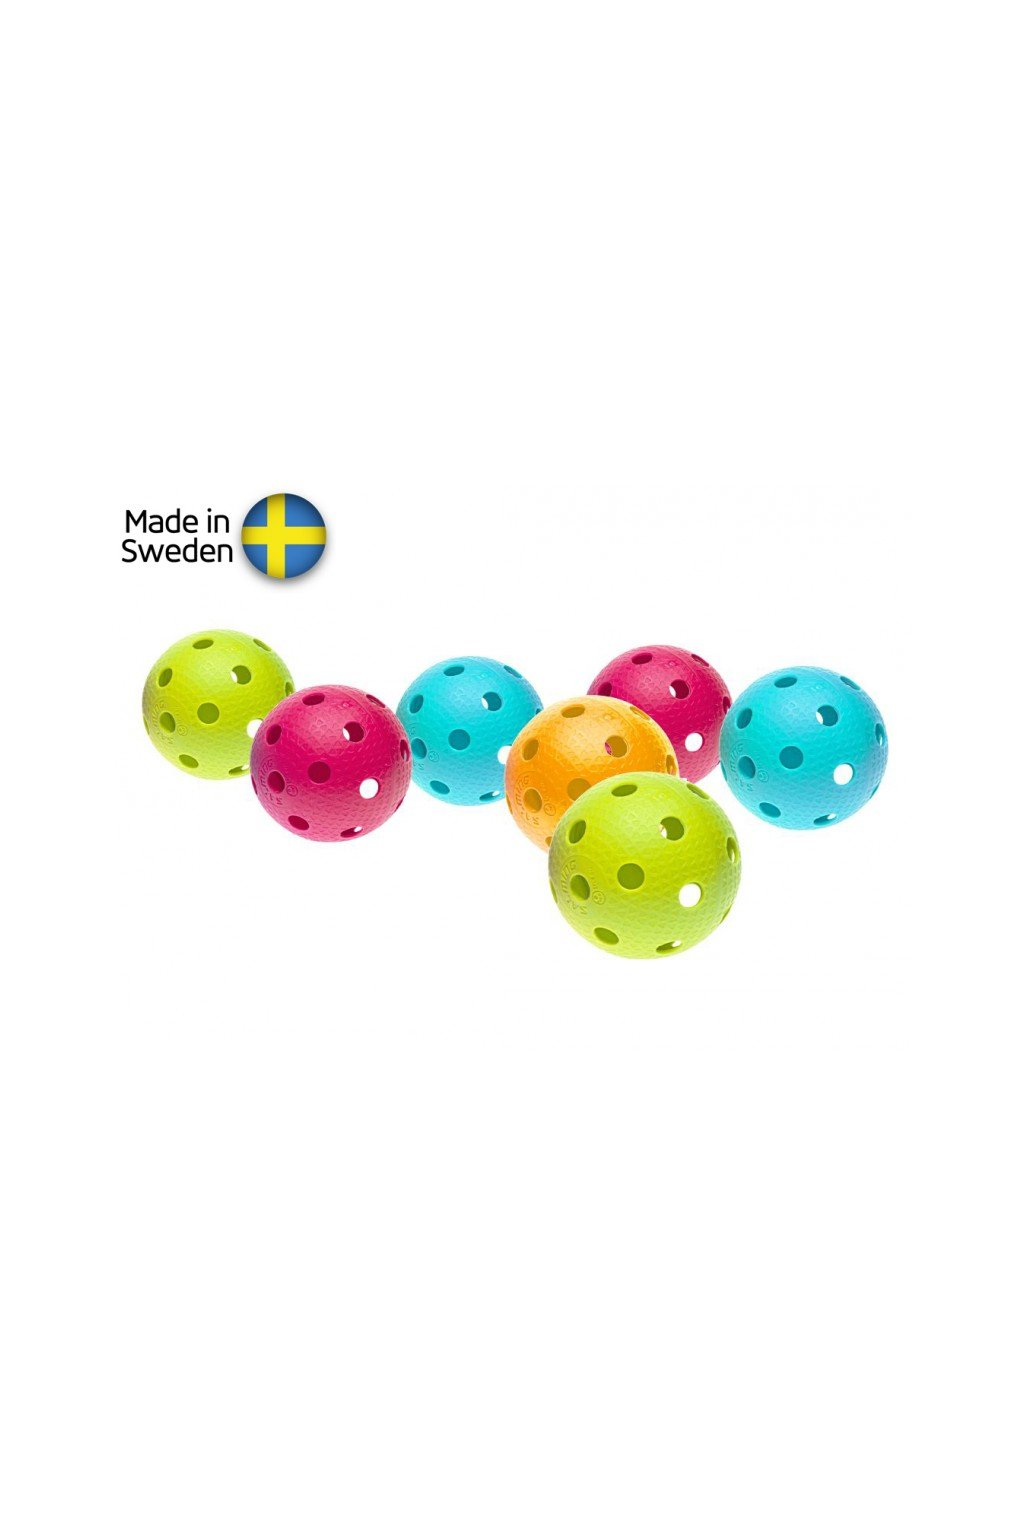 salming aero ball 10 pack colour mix (1)